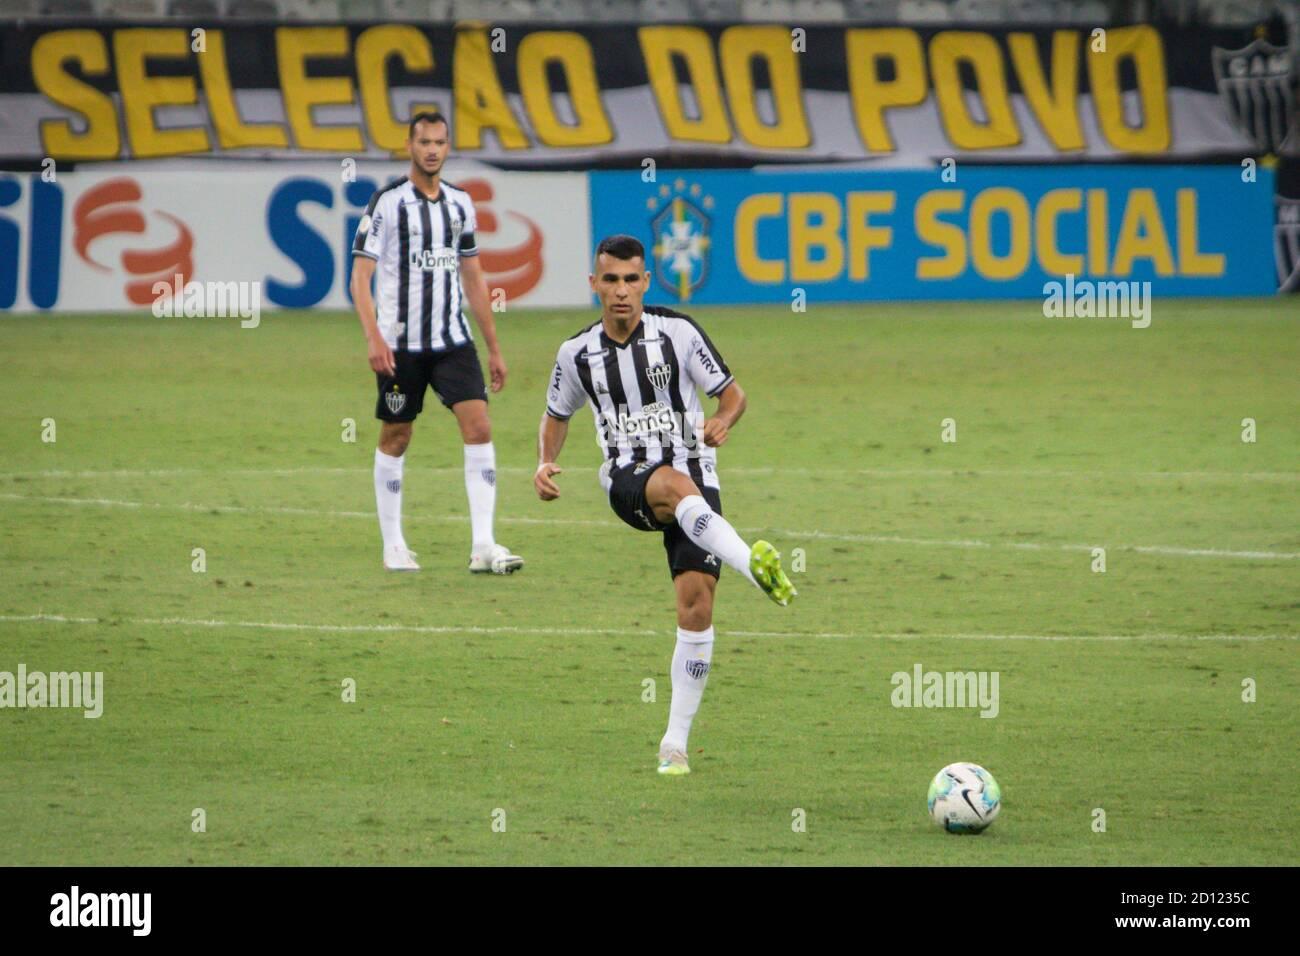 Belo Horizonte Brazil 04th Oct 2020 Junior Alonso Do Atletico During Atletico X Vasco A Match